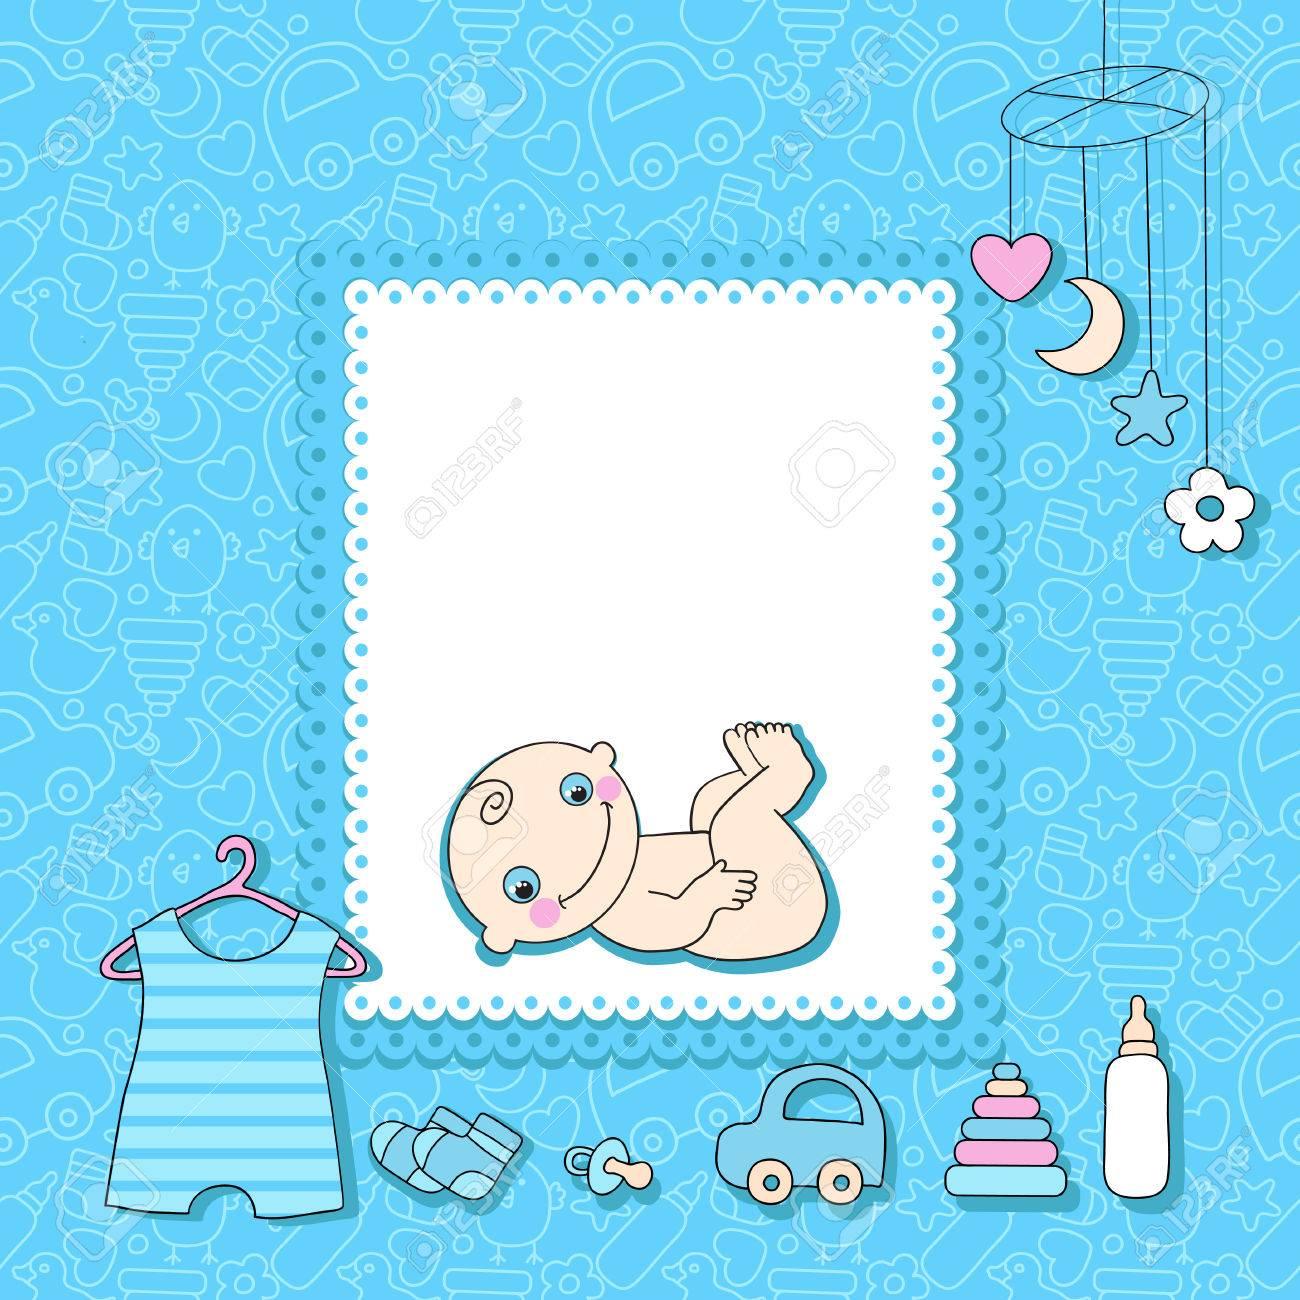 sweet baby boy announcement card style cartoon illustration royalty